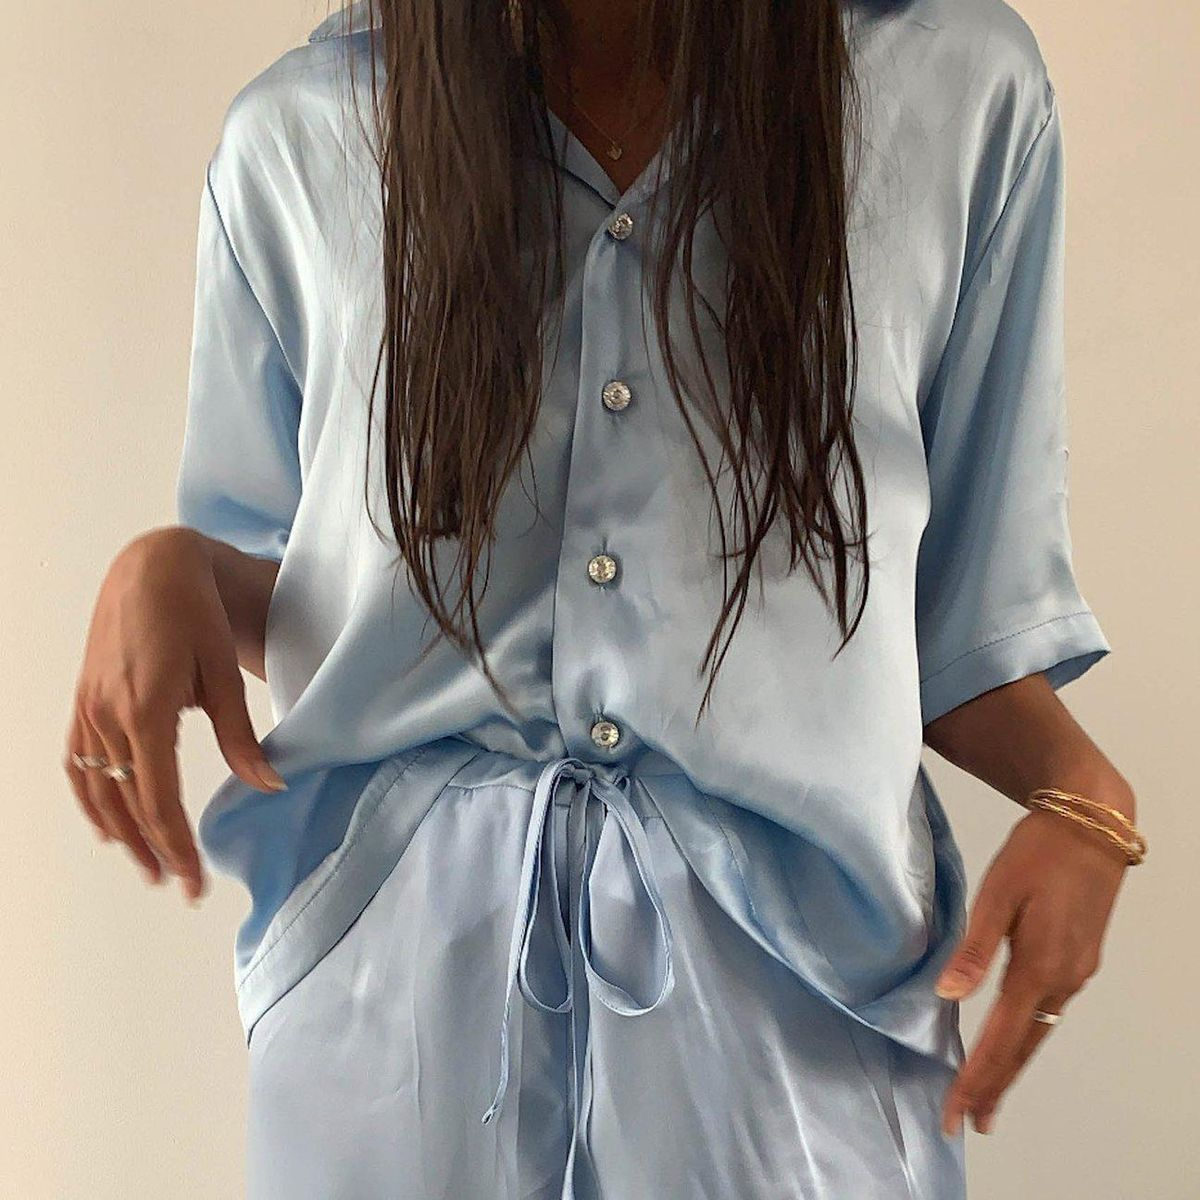 molly perskinsons summer shirt